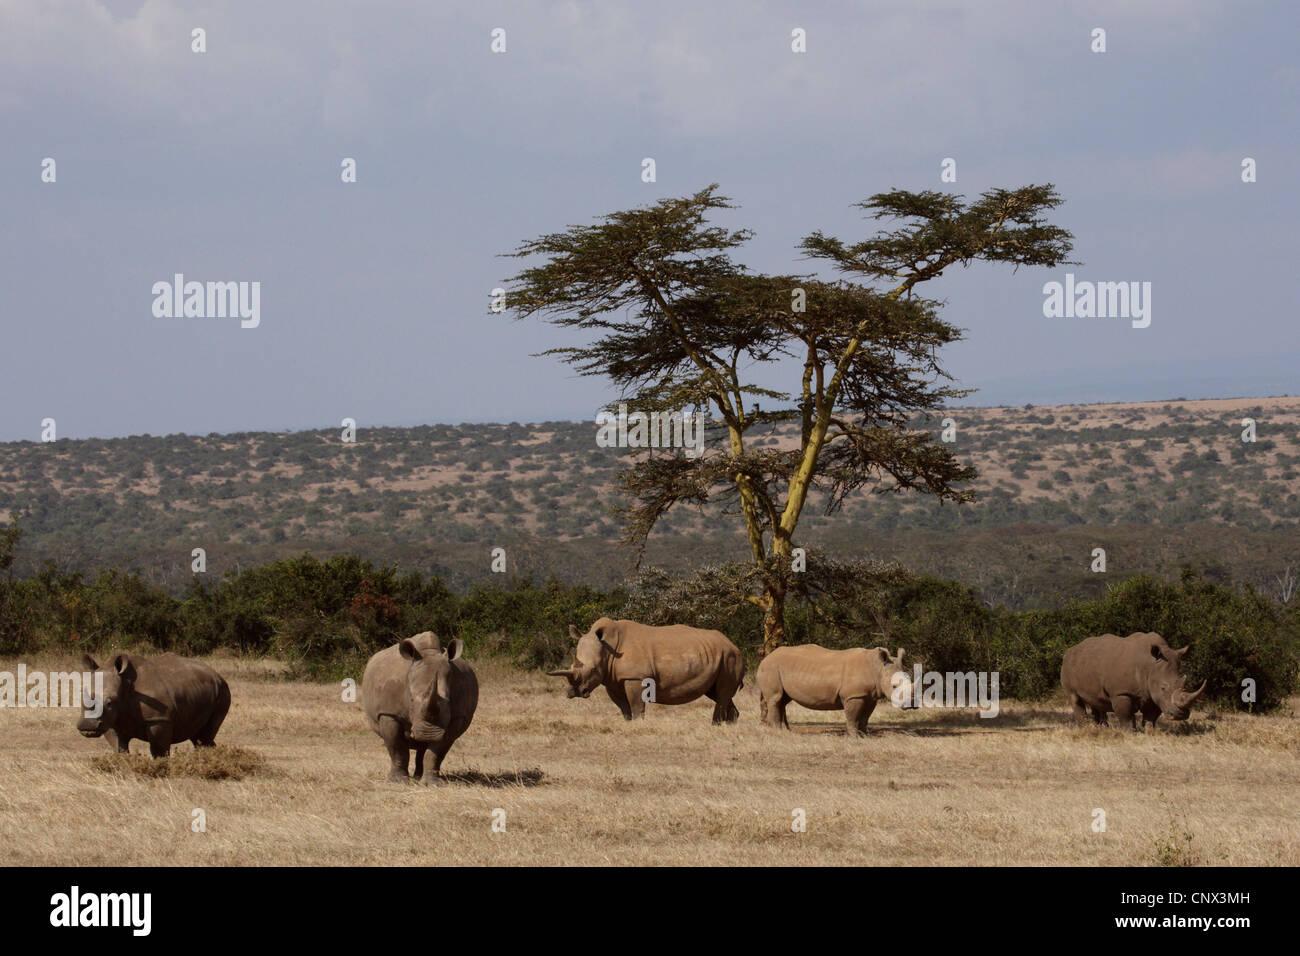 white rhinoceros, square-lipped rhinoceros, grass rhinoceros (Ceratotherium simum), herd in the savannah, Kenya Stock Photo